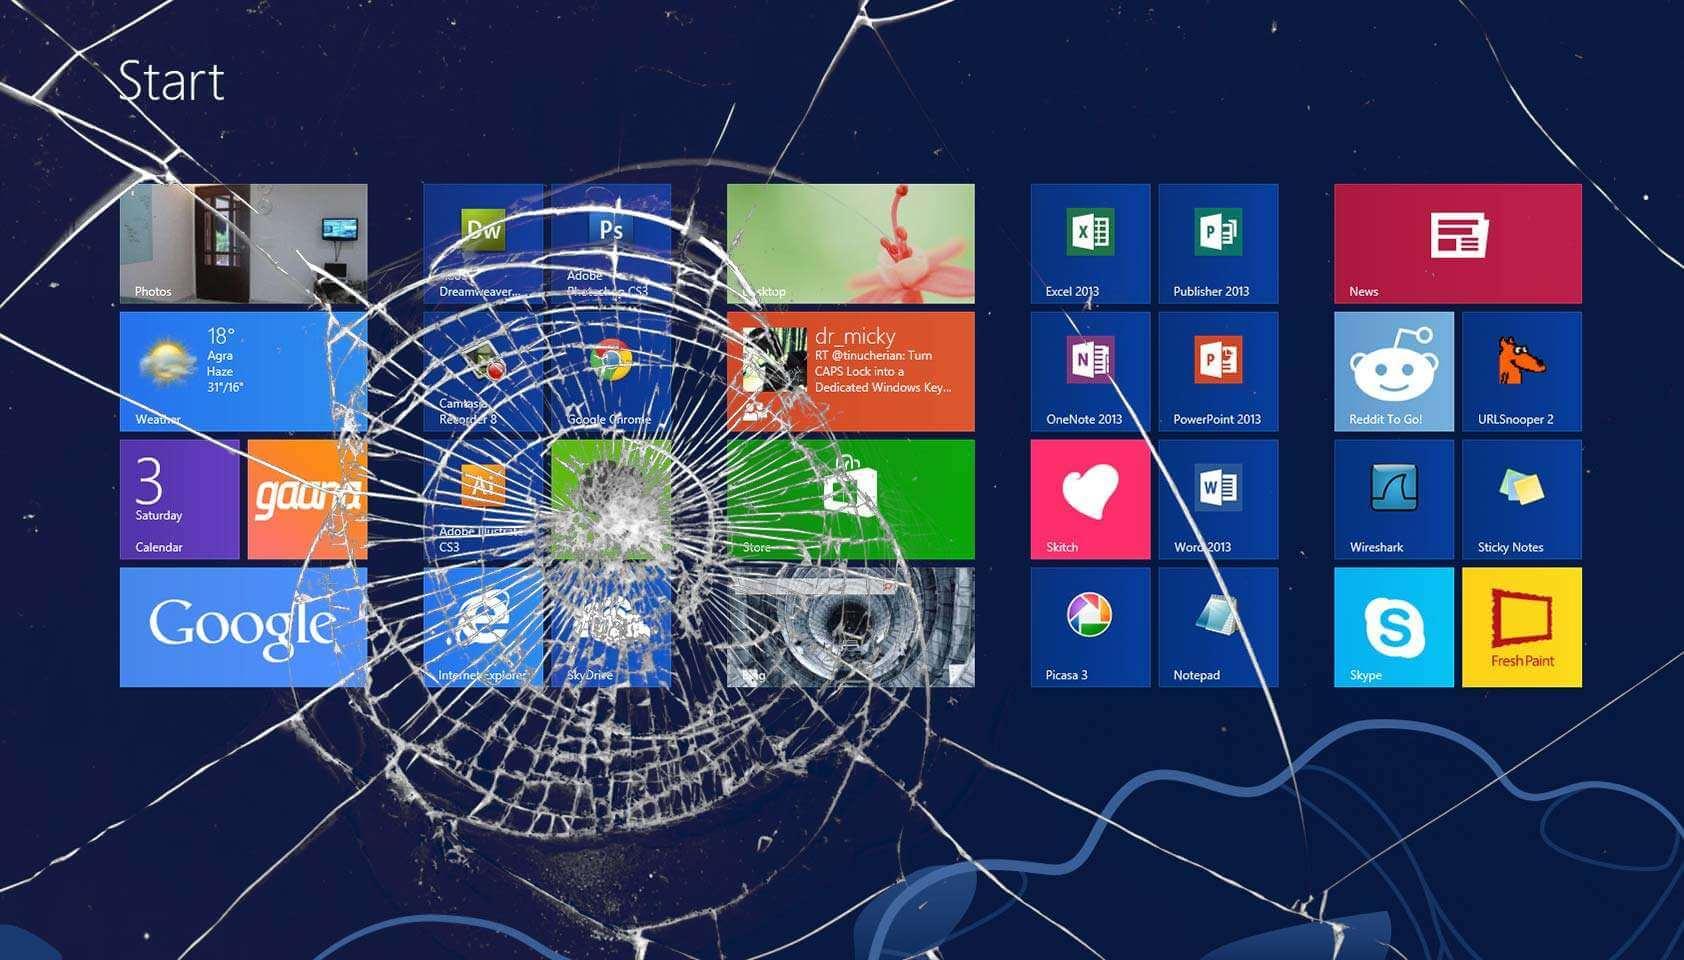 cracked tablet screen repair